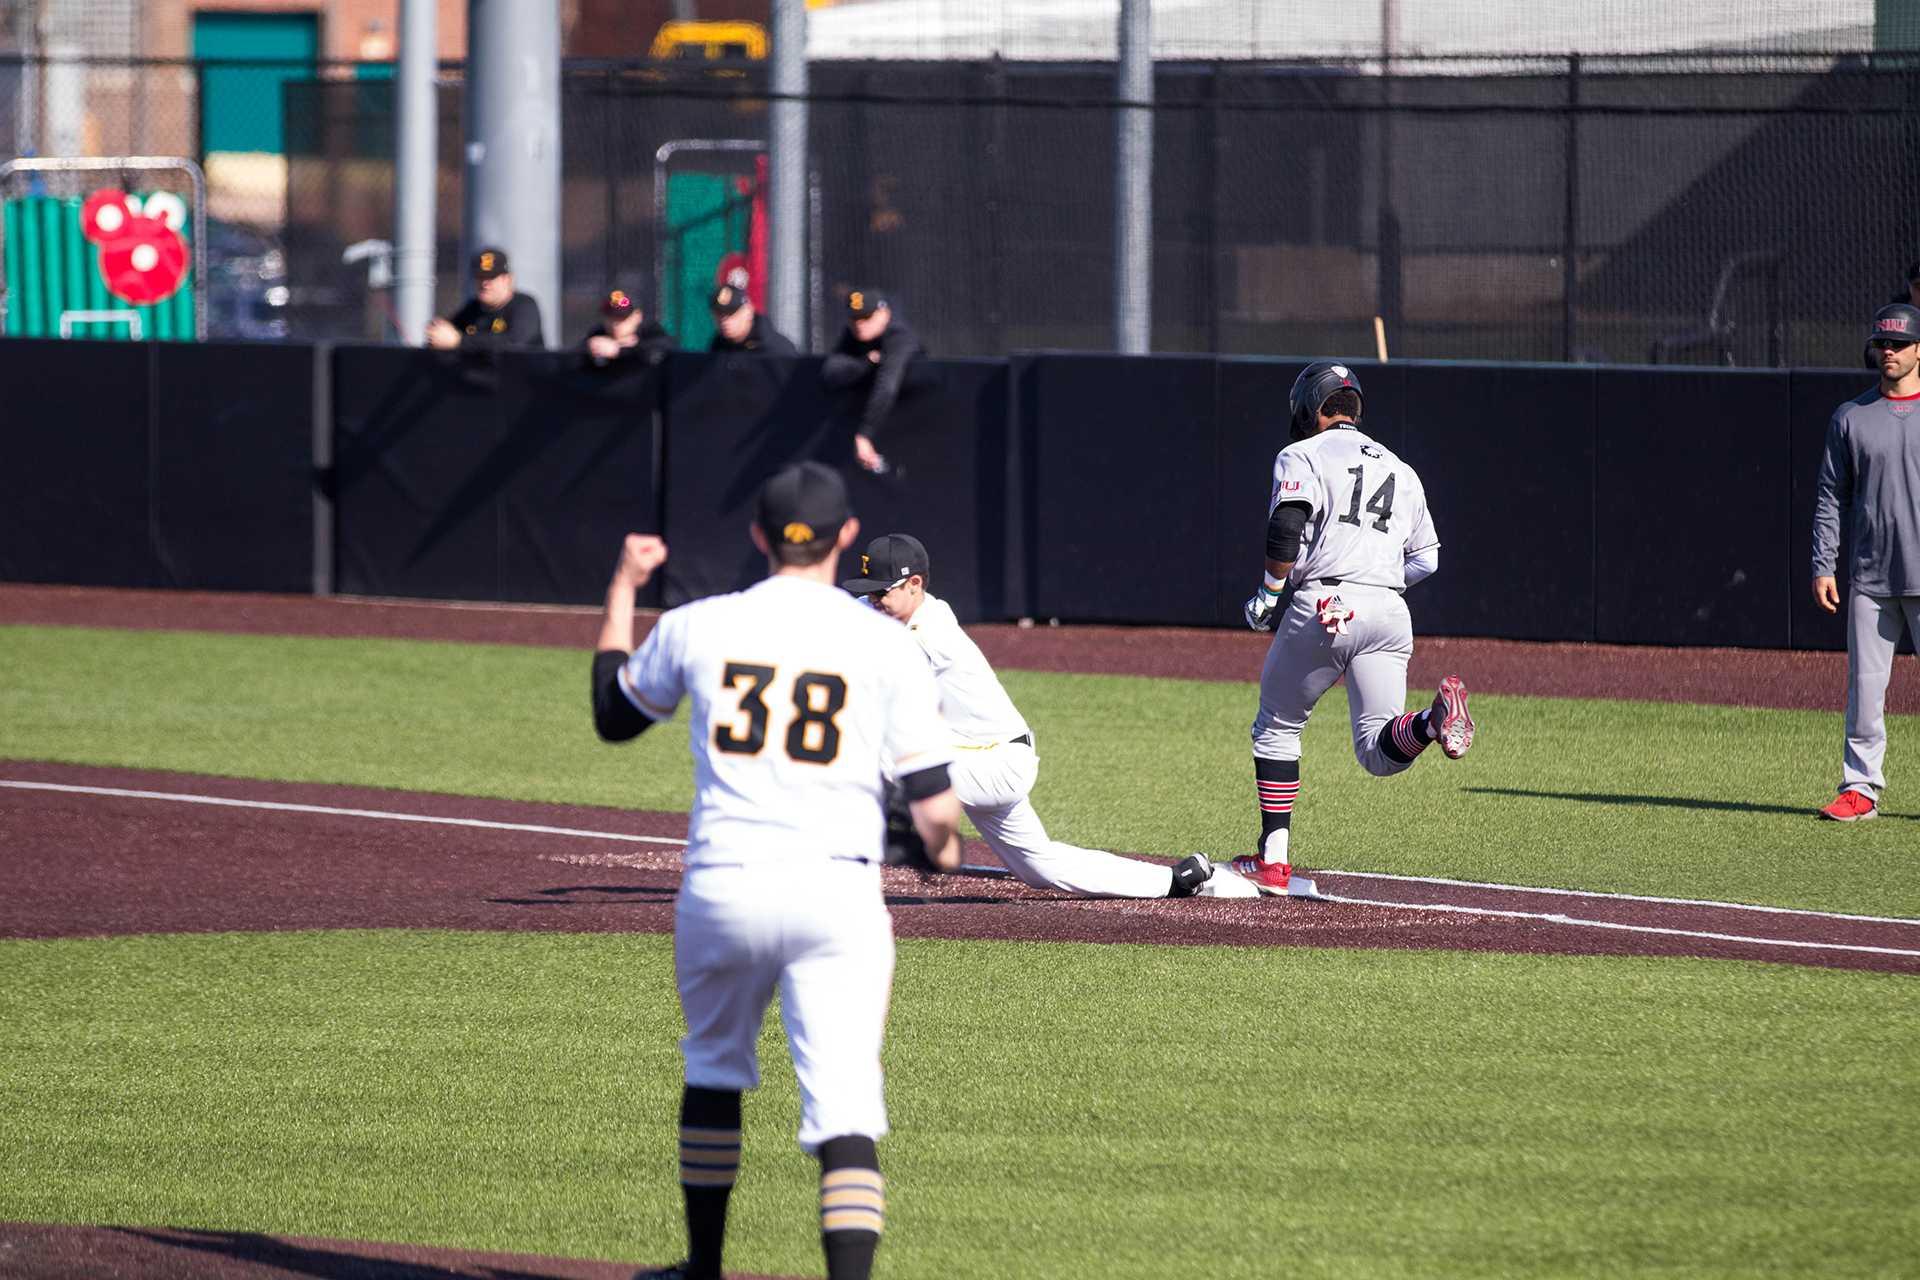 Trenton Wallace celebrates during Iowa baseball vs. Northern Illinois at Banks Field on April 17, 2018. The Hawkeyes won the game 2-0. (Megan Nagorzanski/The Daily Iowan)